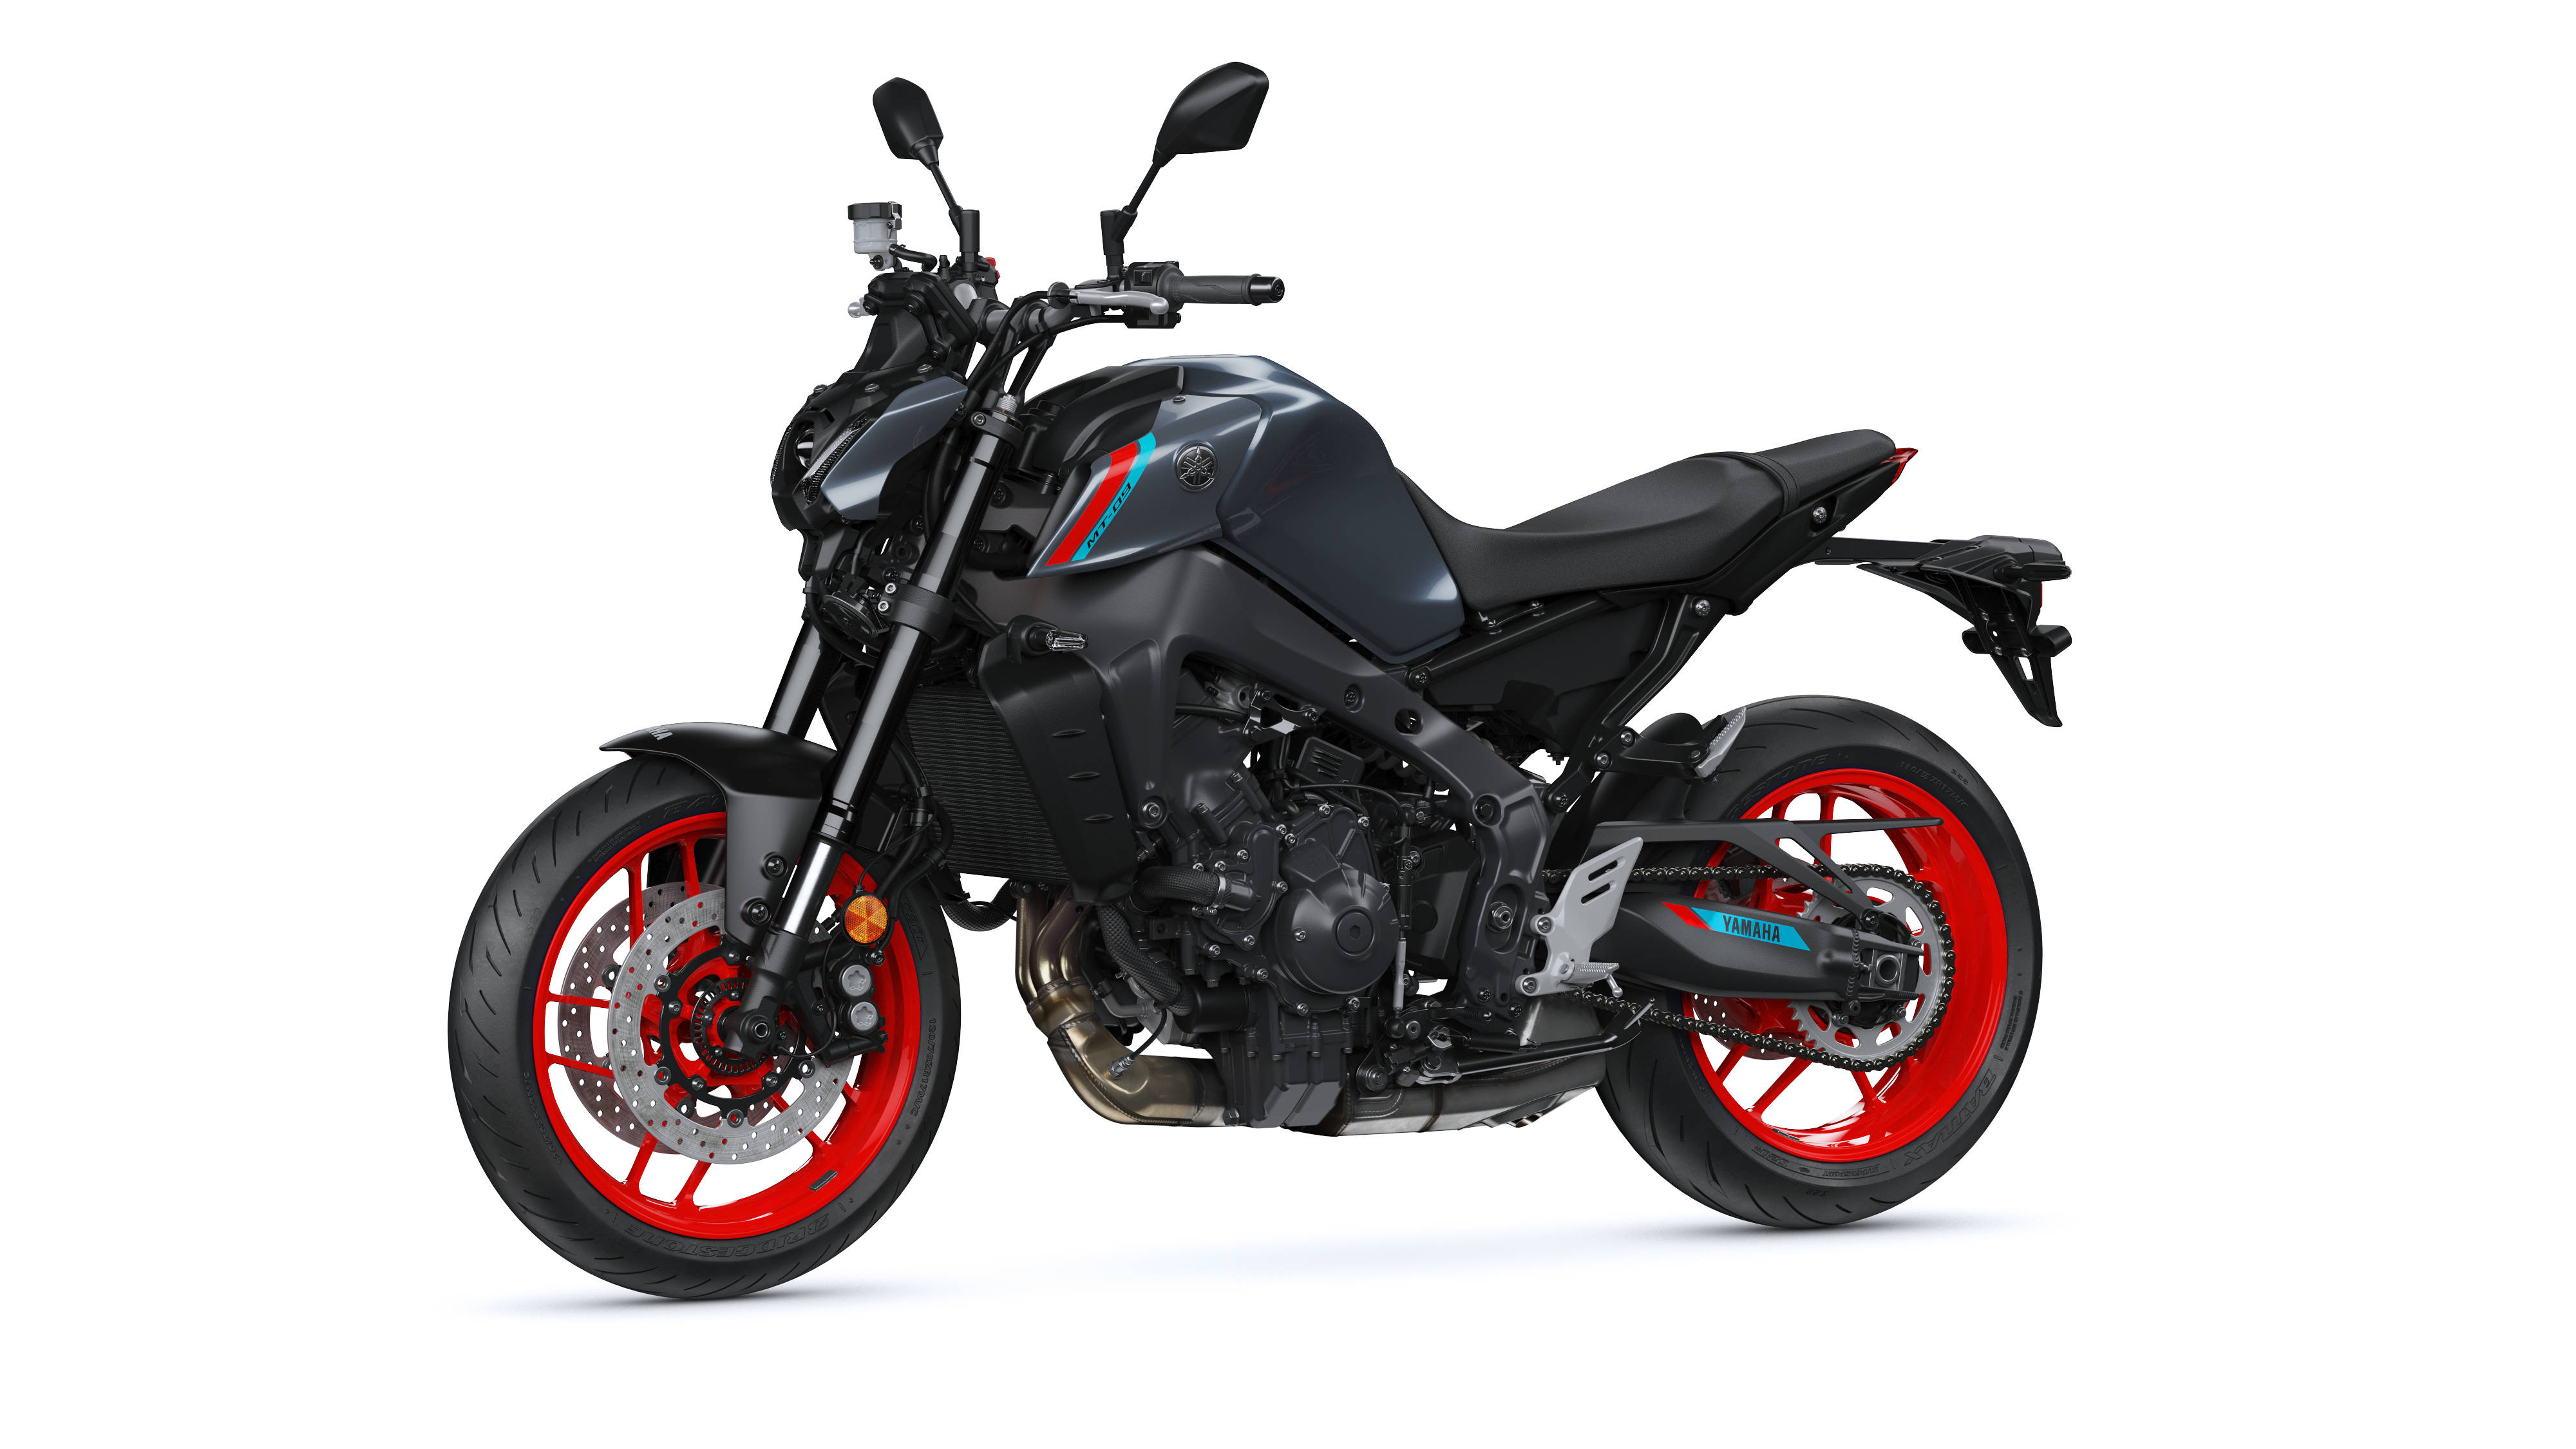 2021 Yamaha MT-09 SP First Look